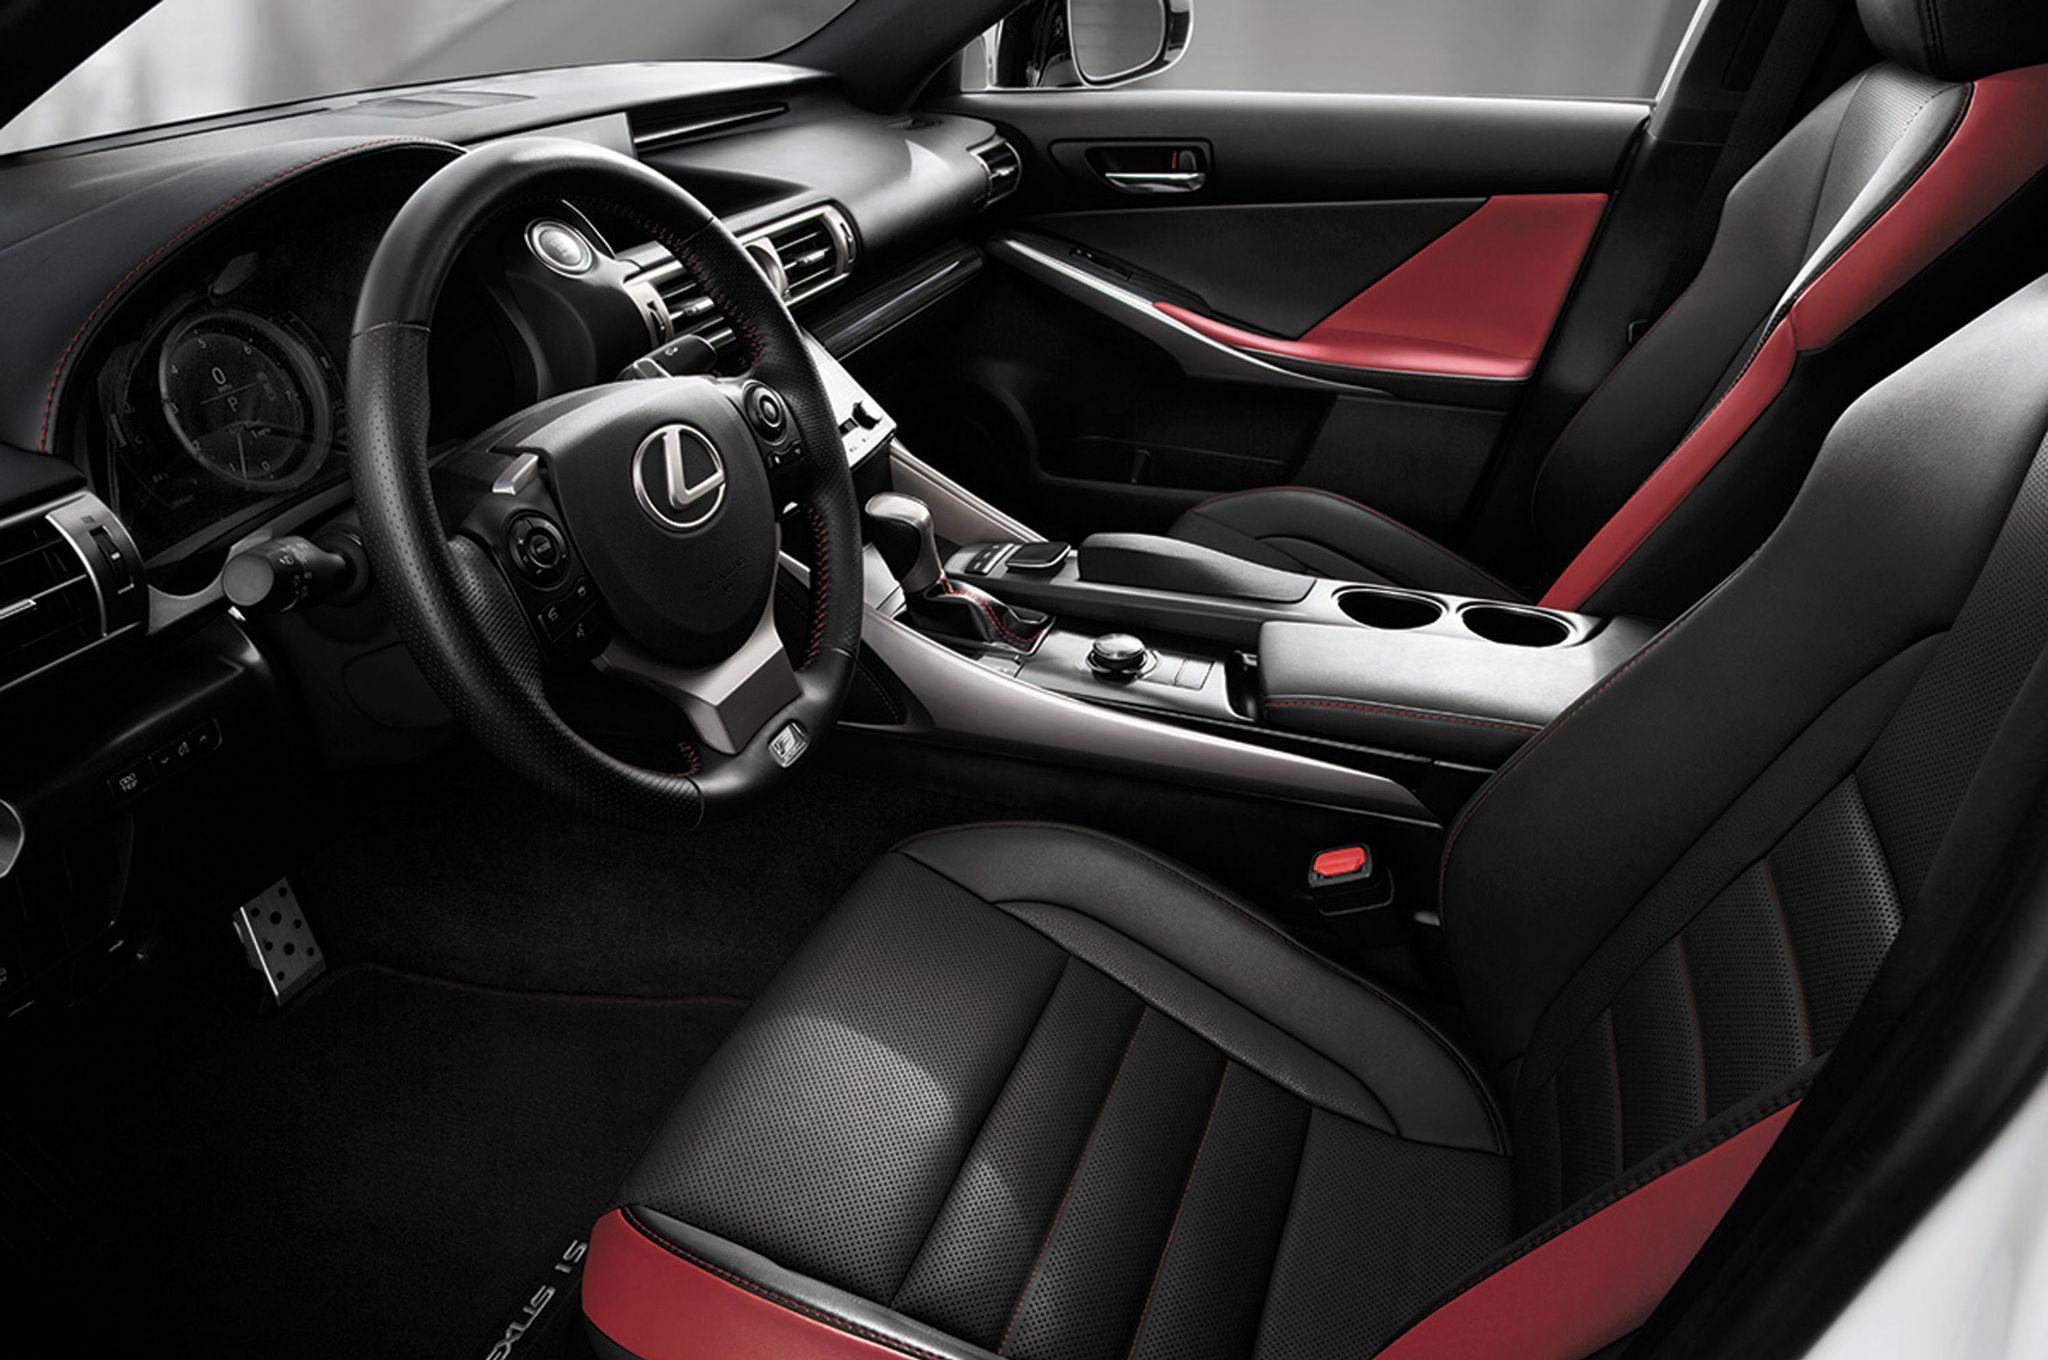 lexus 2015 sedan interior. 2013 lexus gs 350 f sport cockpit brown black silver grey auto addiction interiors pinterest cars 2015 sedan interior